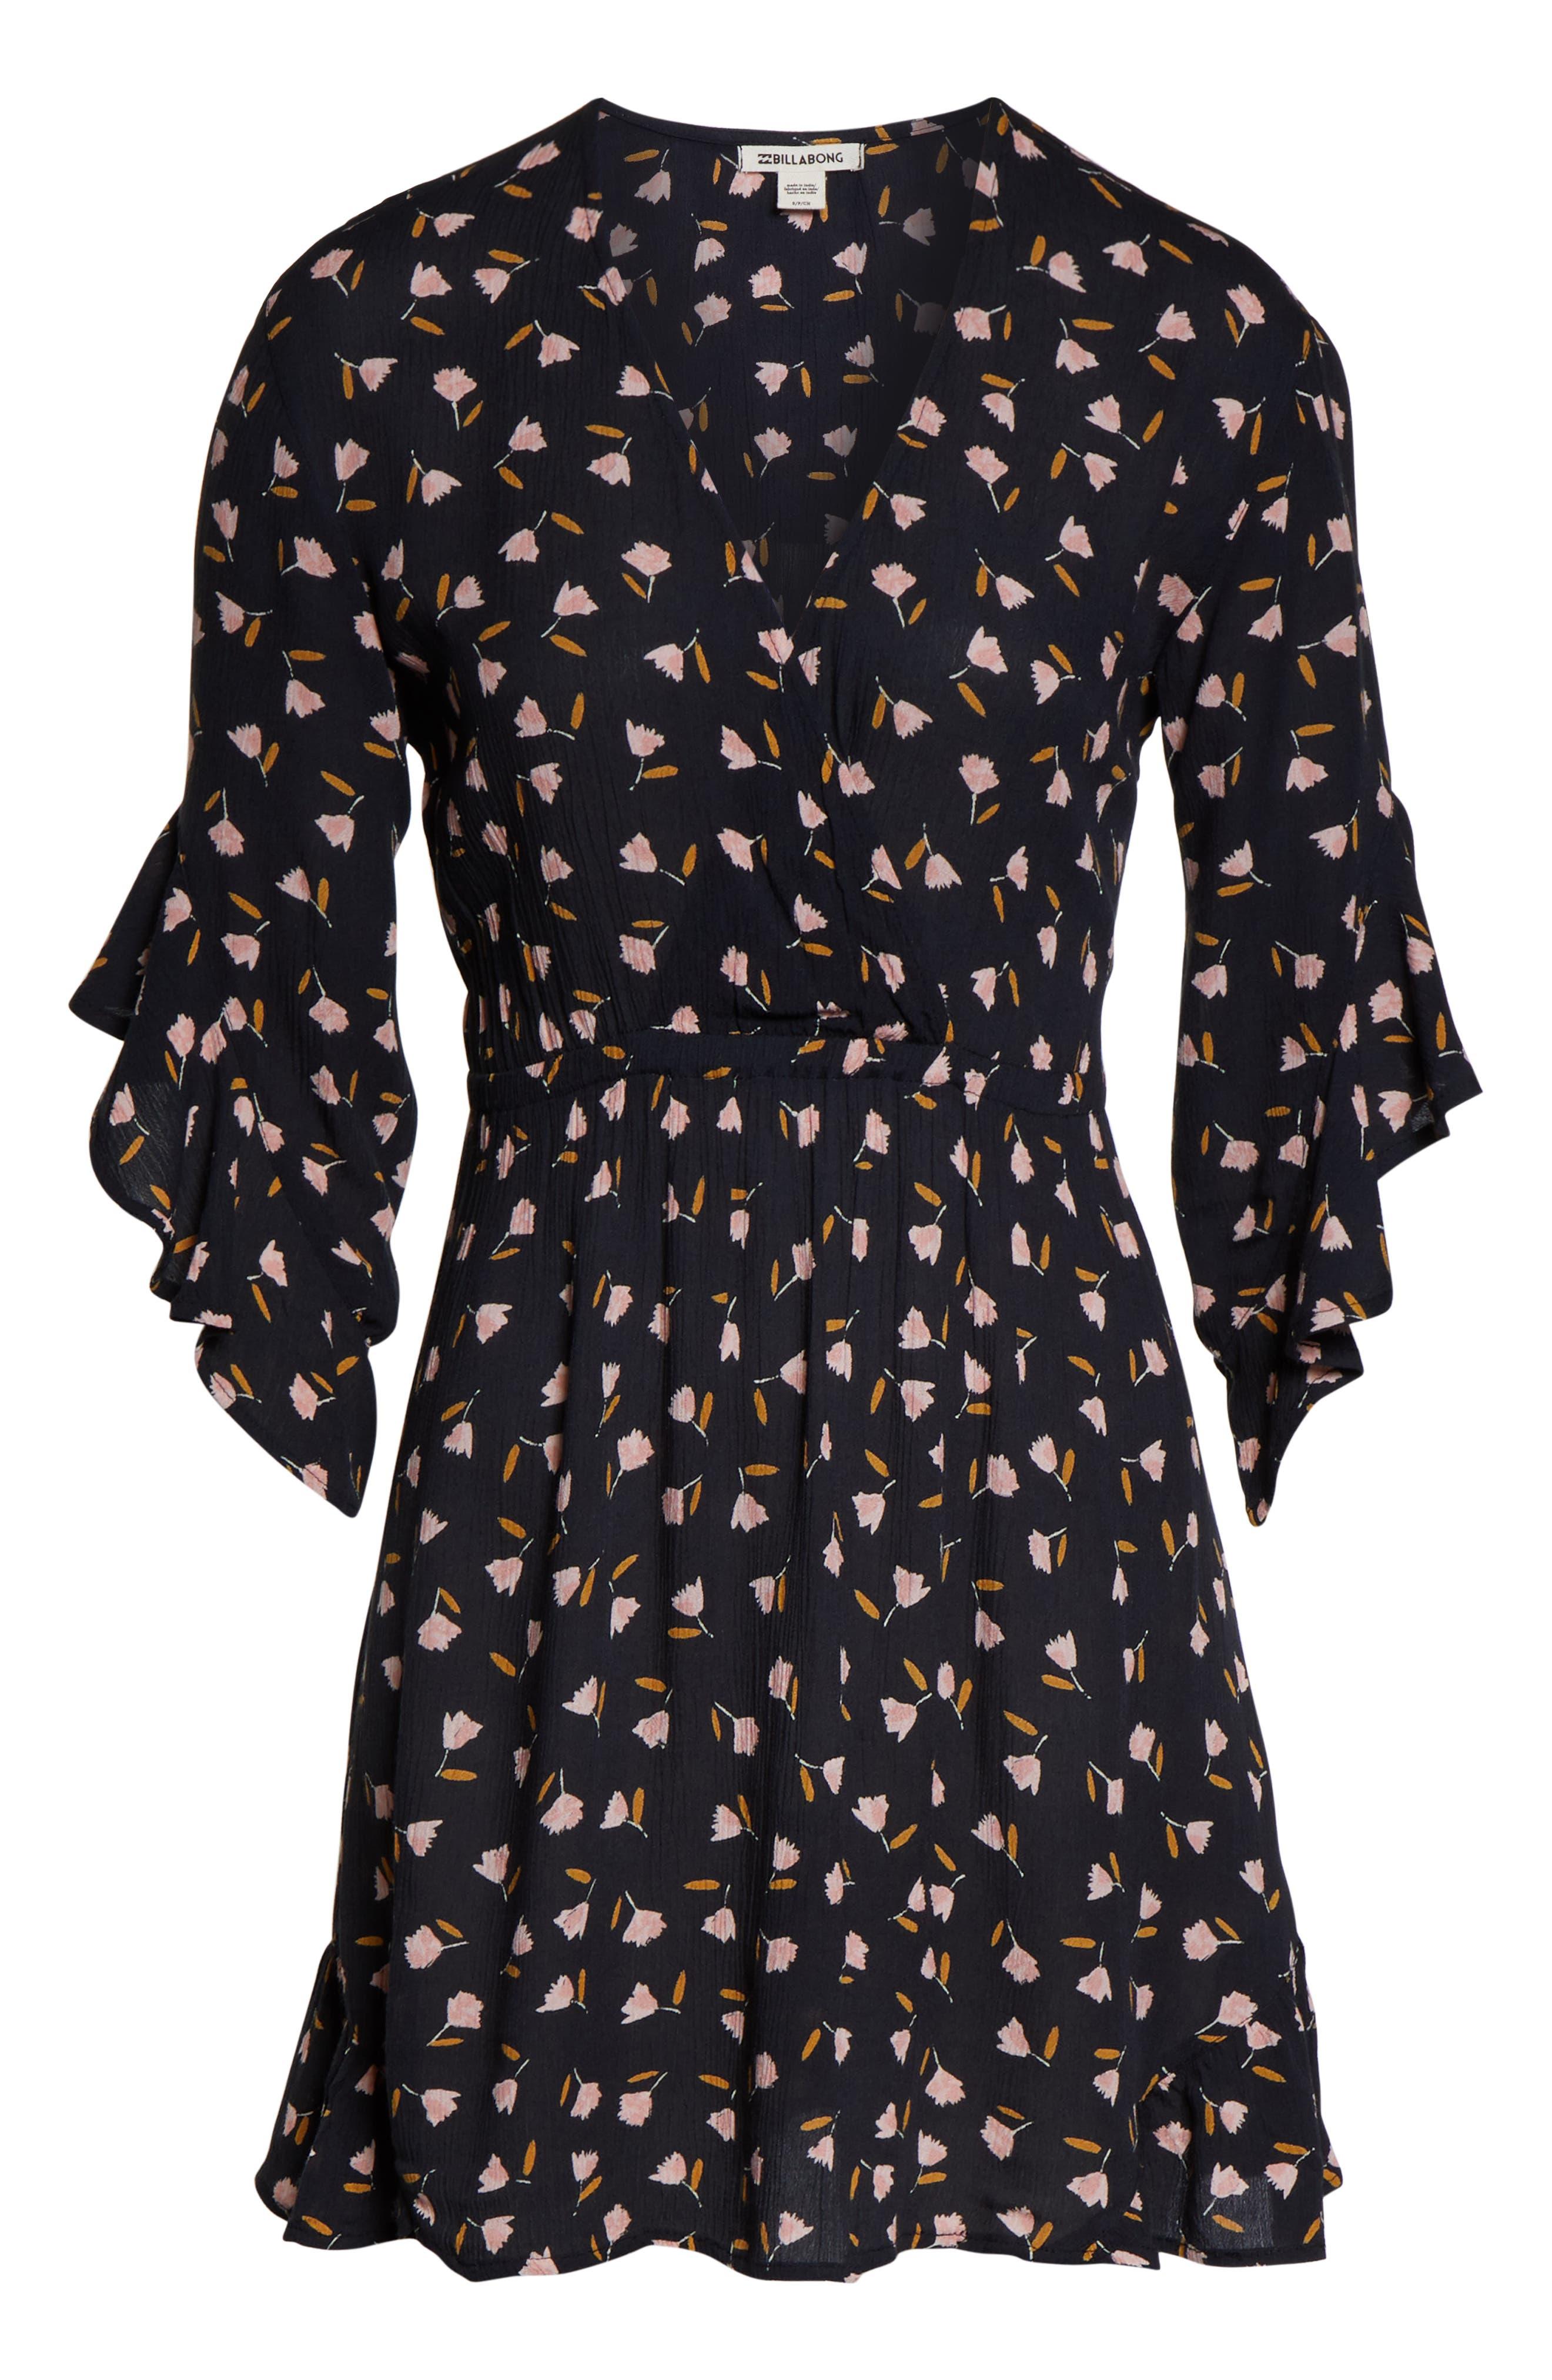 BILLABONG,                             Love Light Floral Print Dress,                             Alternate thumbnail 4, color,                             001